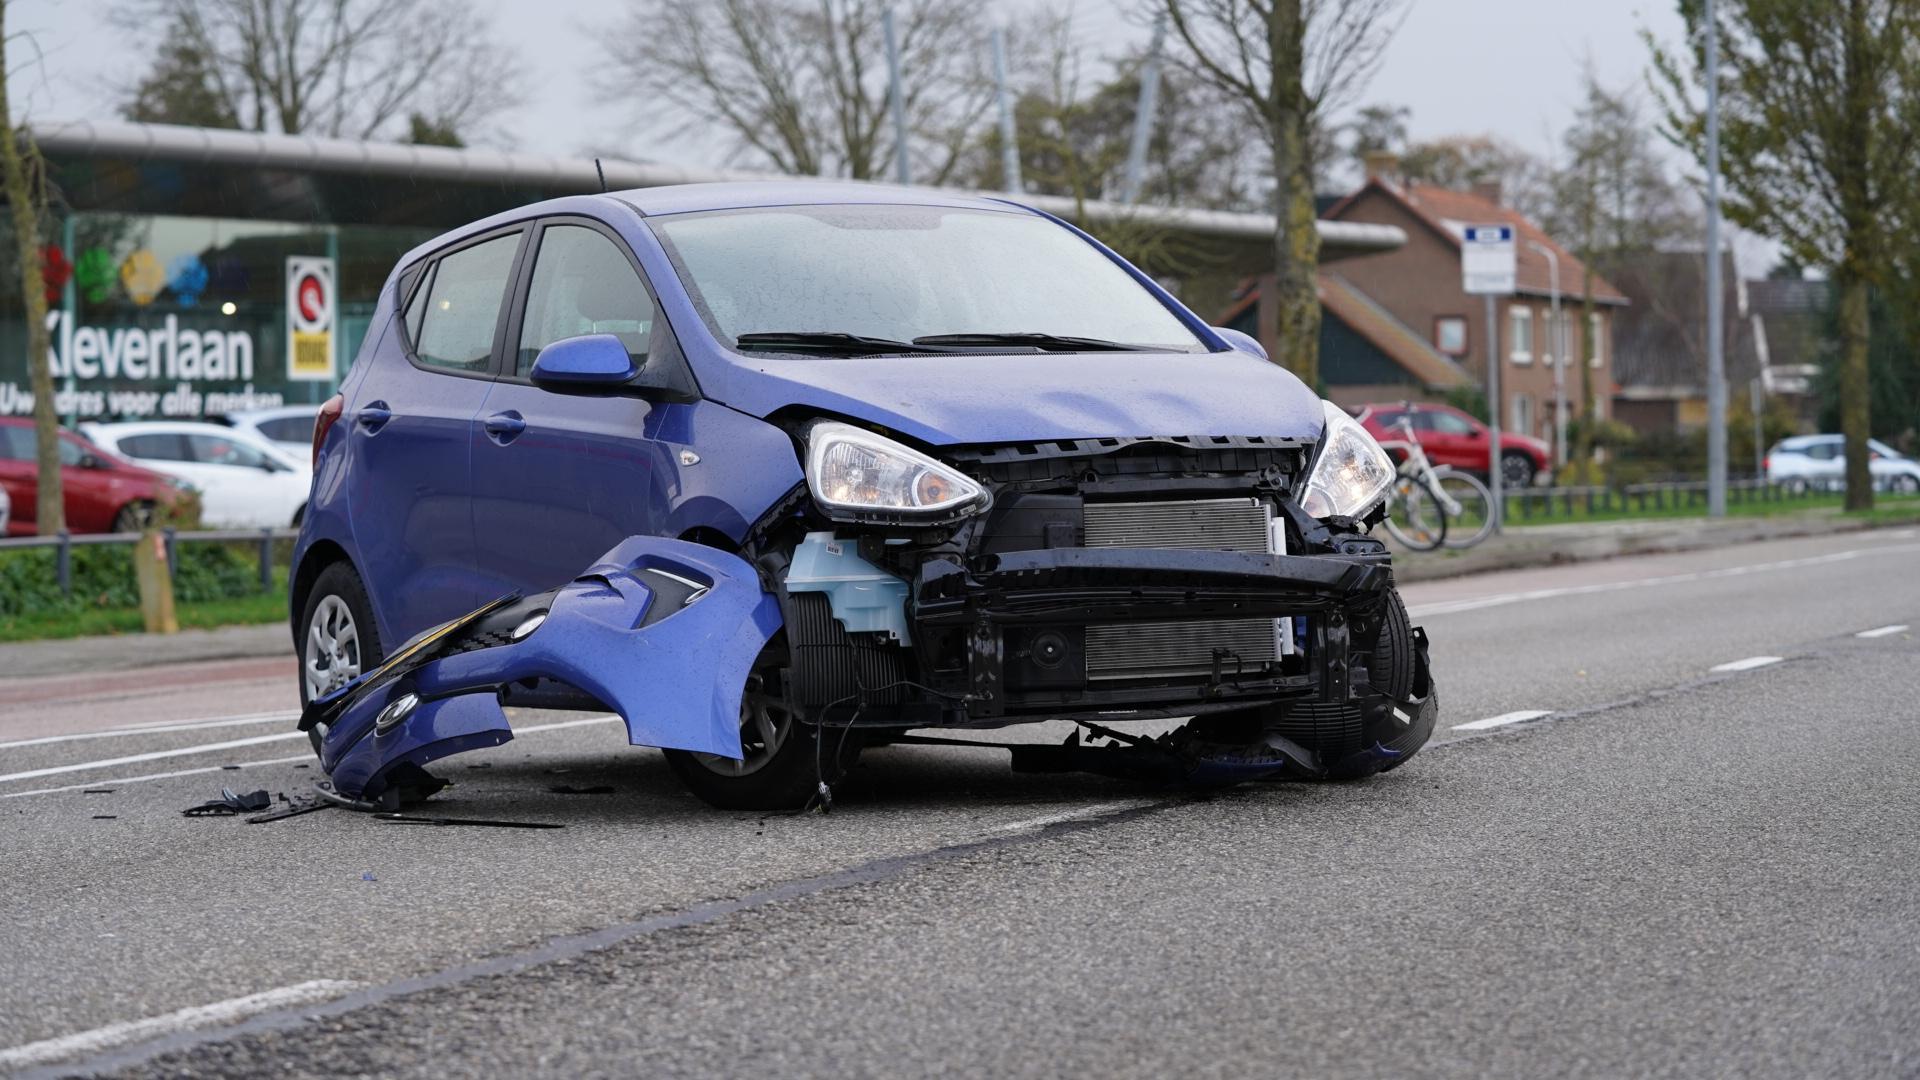 Rijksweg in Limmen afgesloten na auto-ongeluk